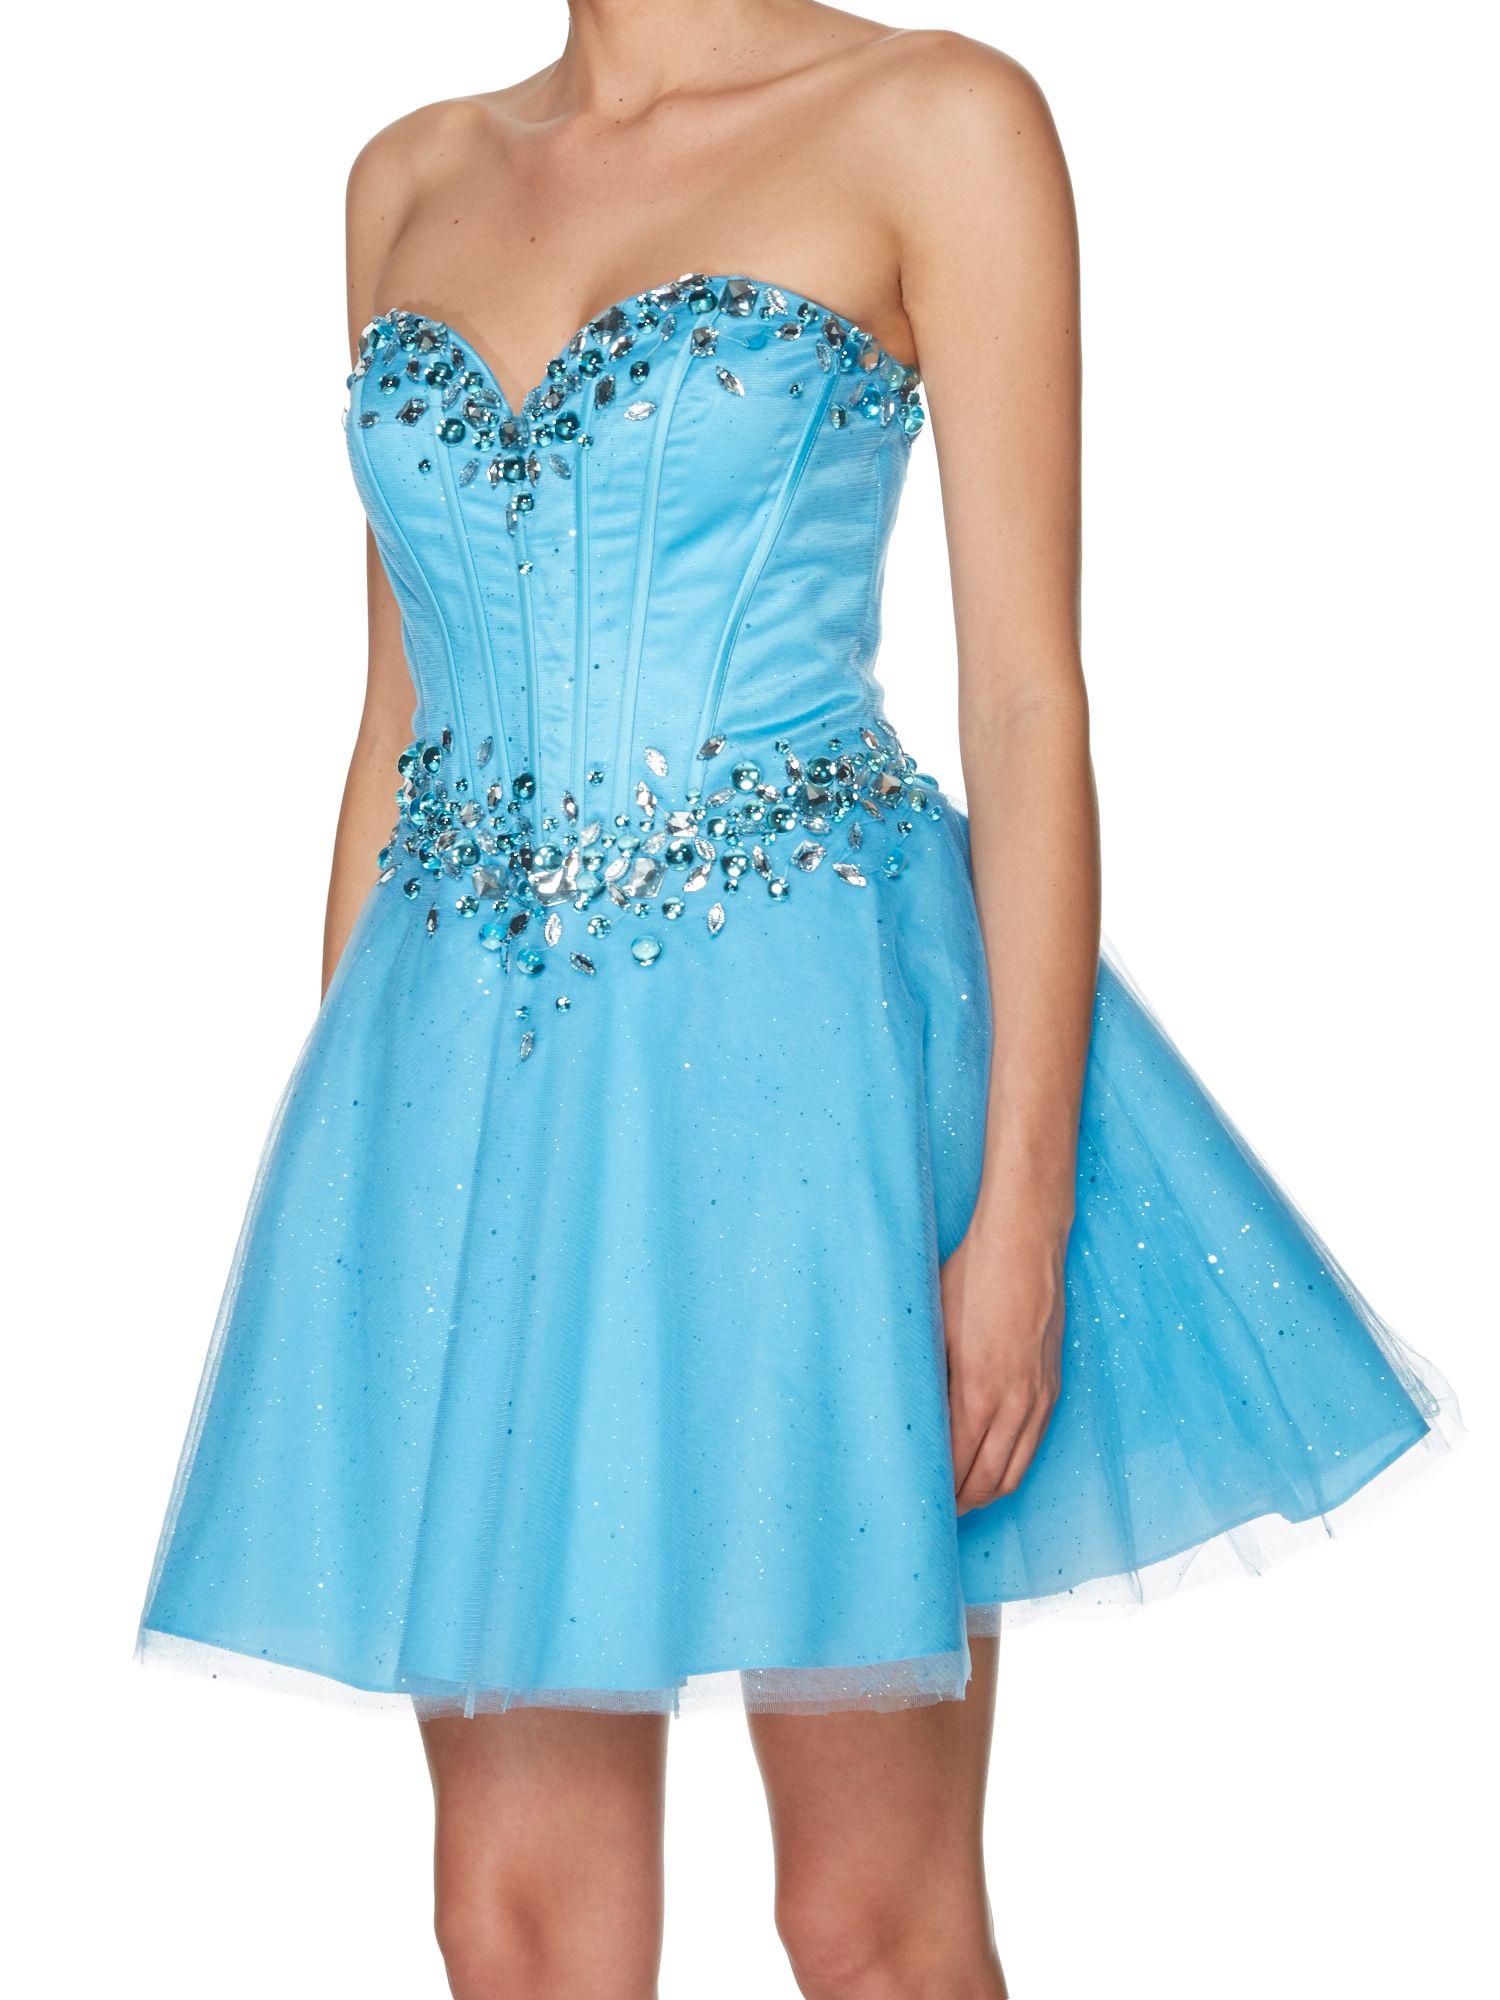 Modern Kijiji Prom Dresses Vignette - All Wedding Dresses ...